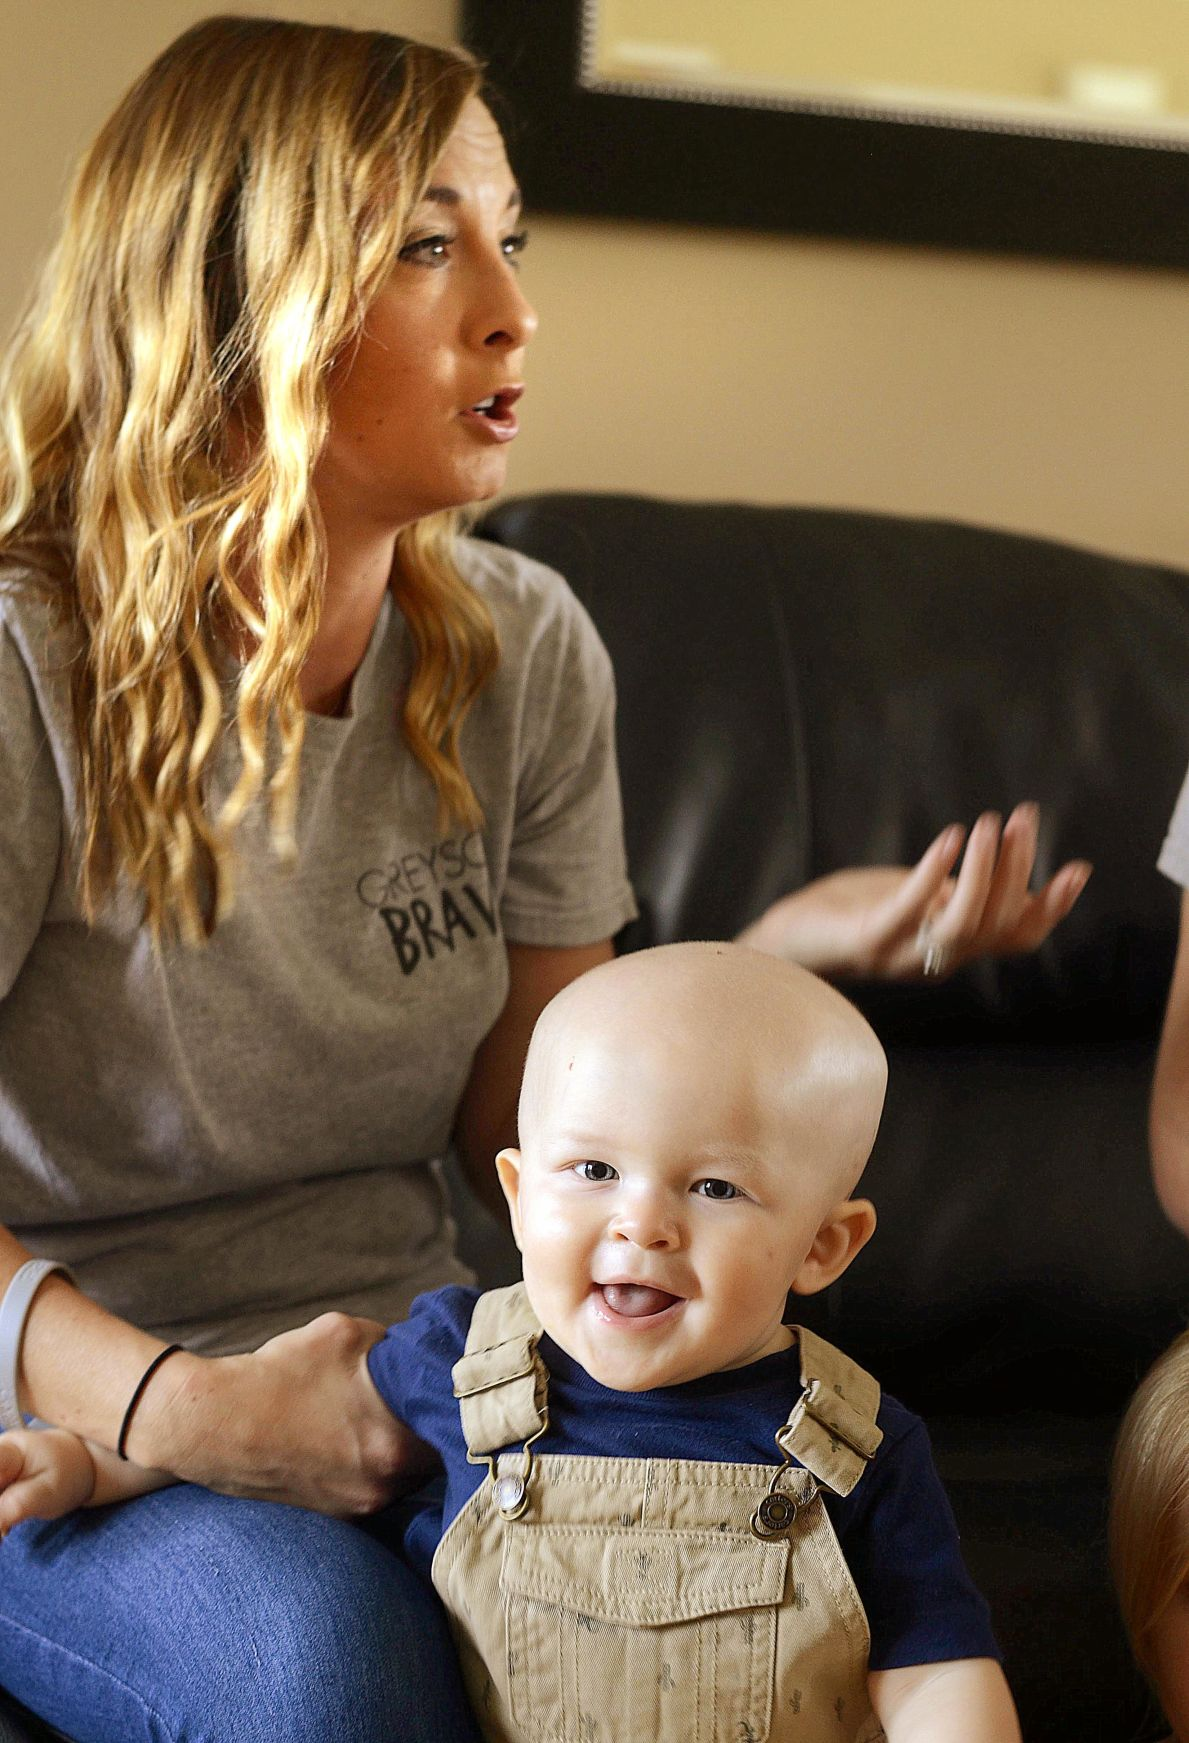 Conover 1 year old Greyson Stephens battles rare form of sar a